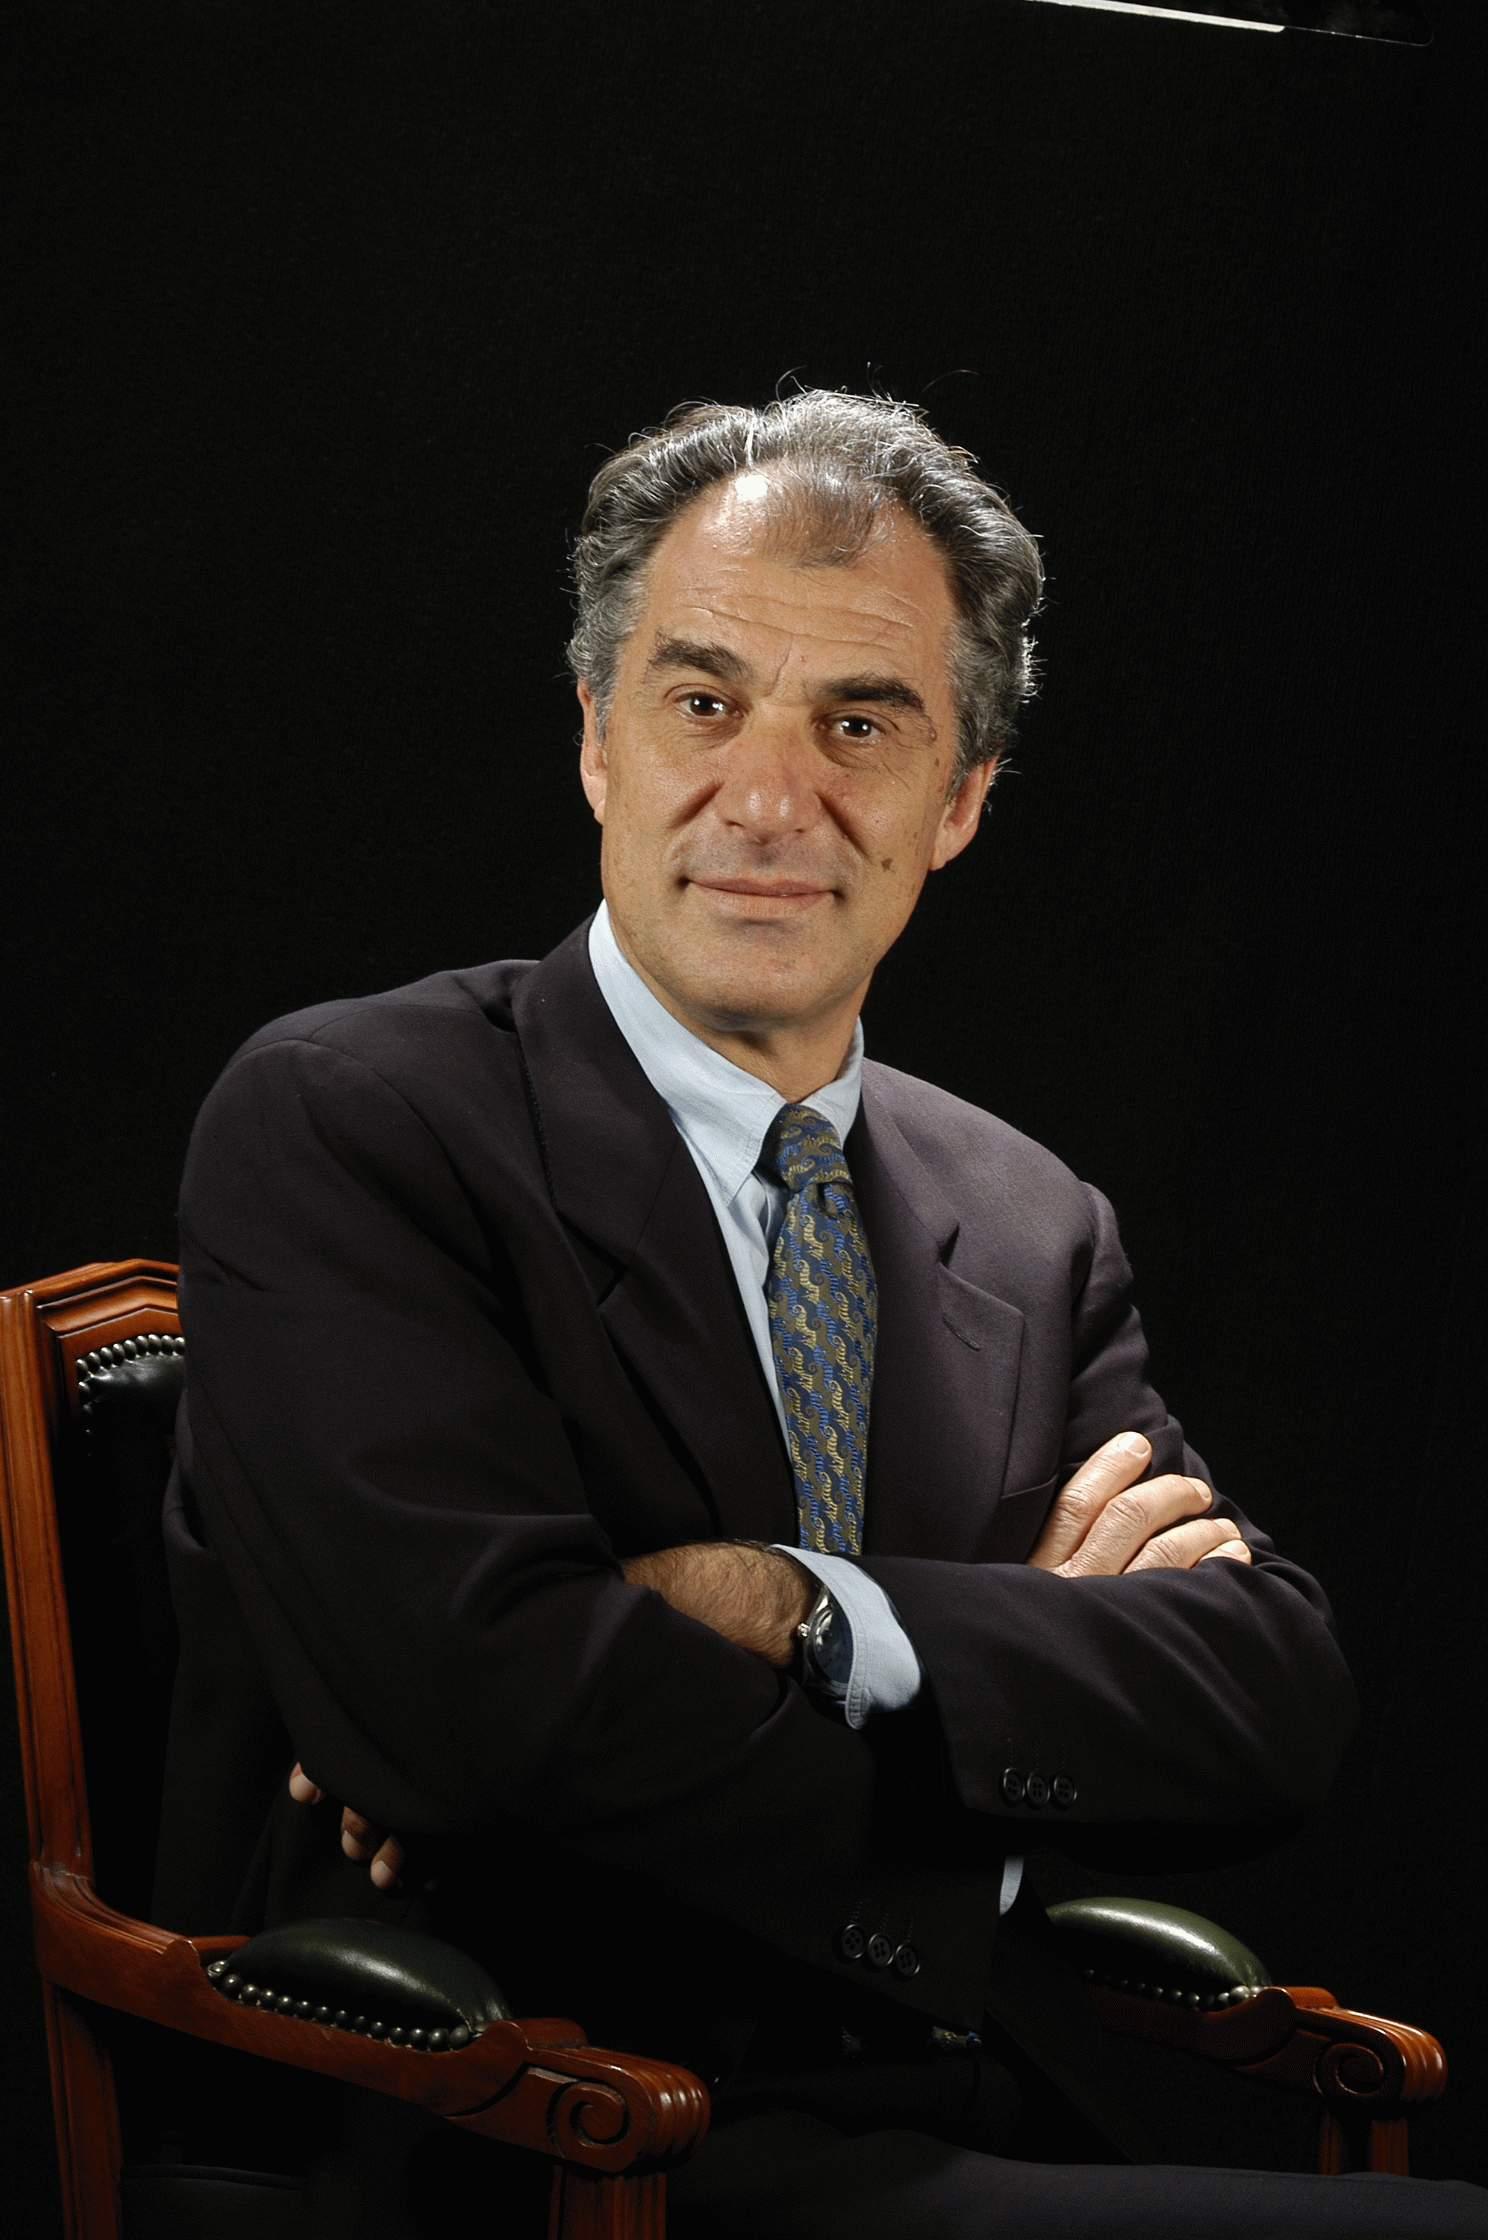 DR. JOSEP LLOVERAS I MACIÀ